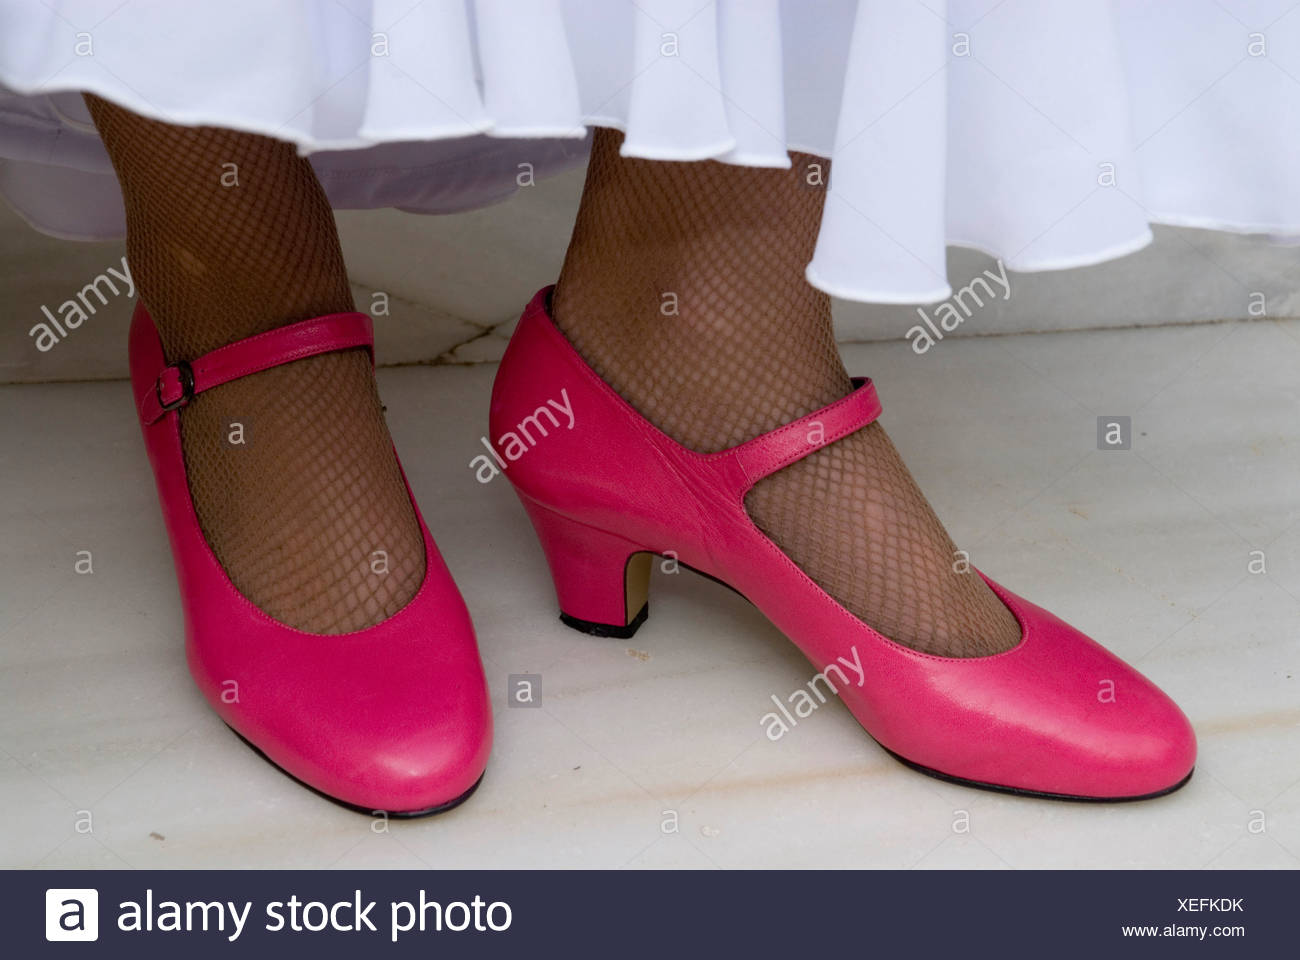 Flamenco dancer with pink shoes, Conservatorio de Danza, Sevilla, Andalusia, Spain, Europe Stock Photo